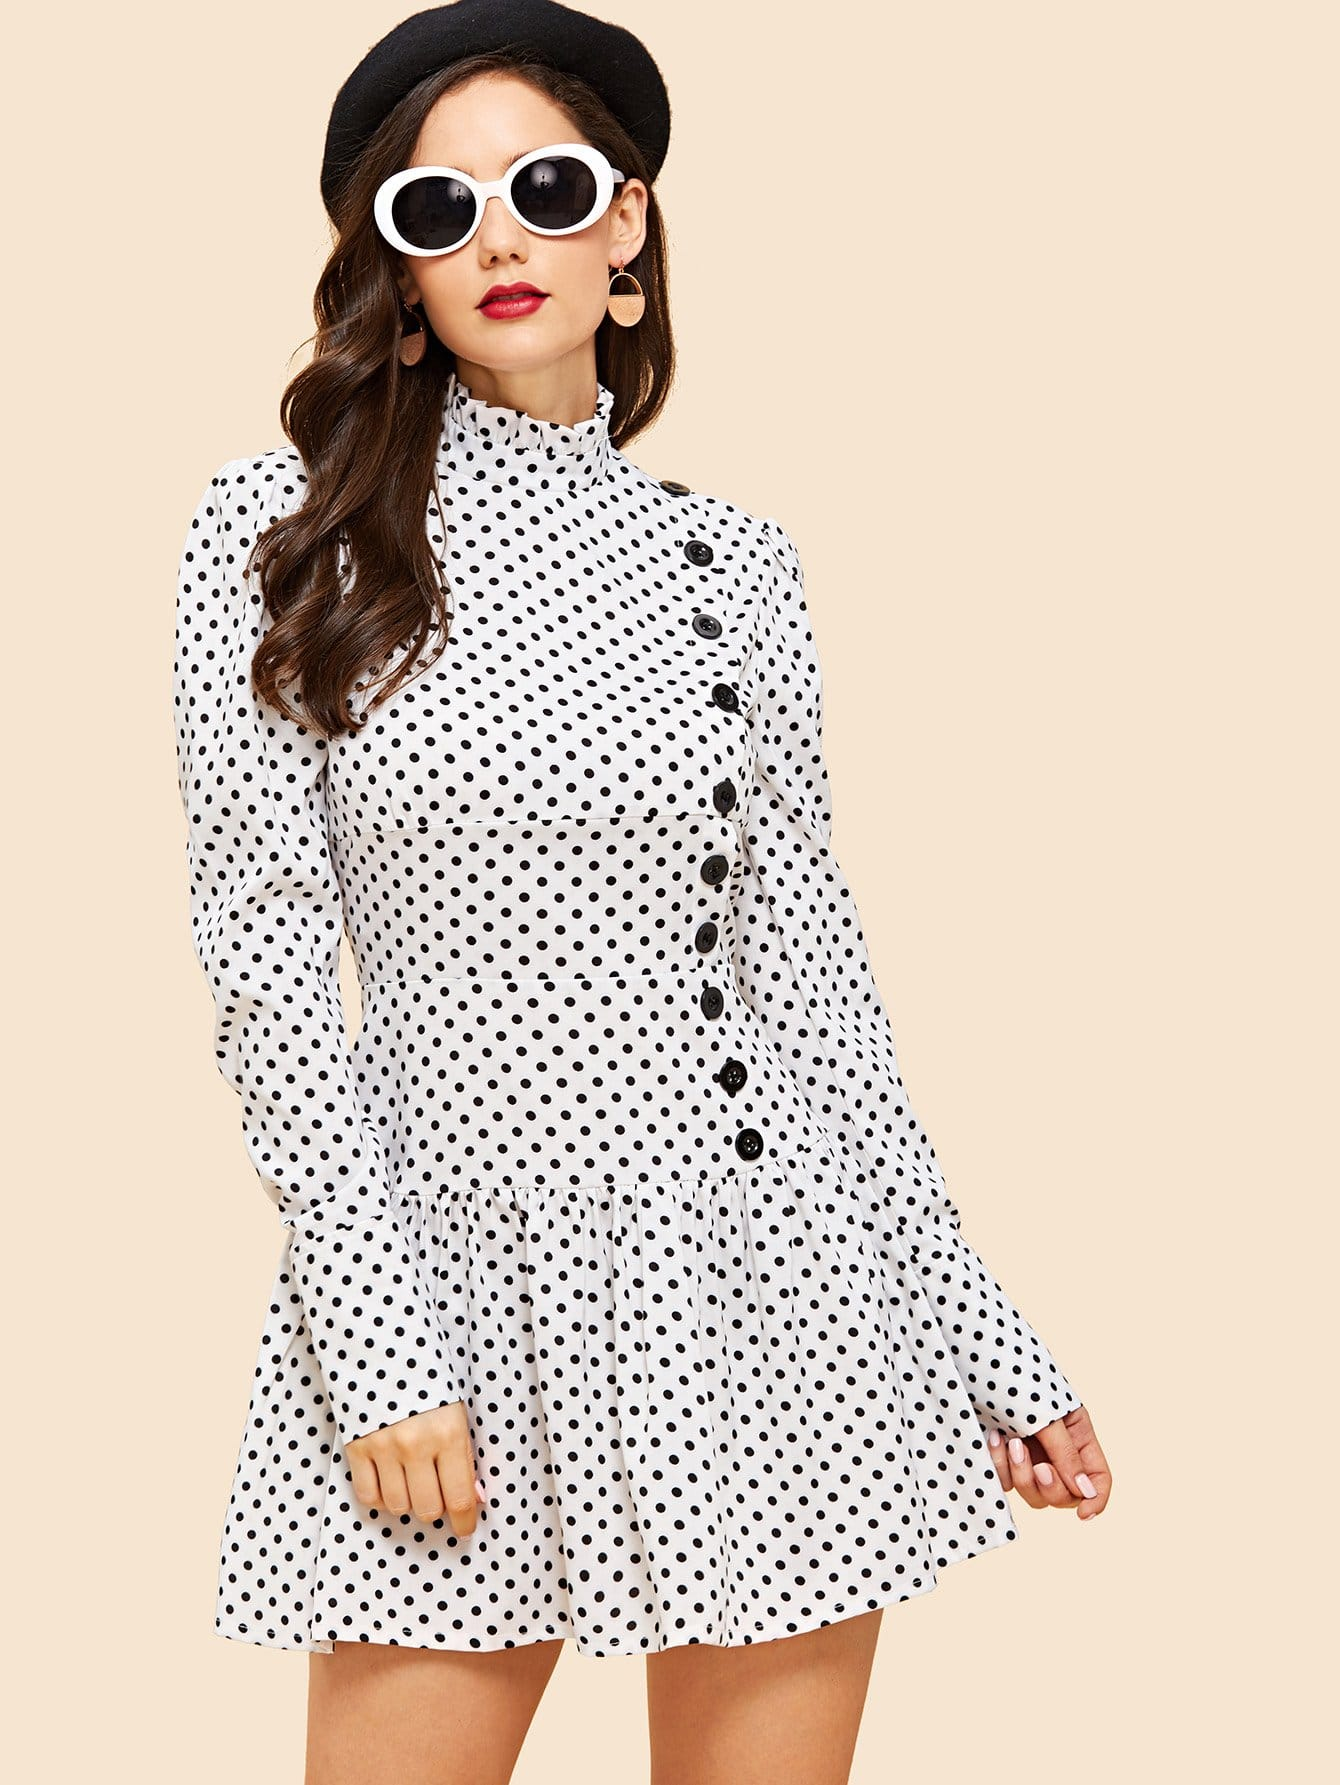 Single Breasted Polka Dot Dress kanna kv6144